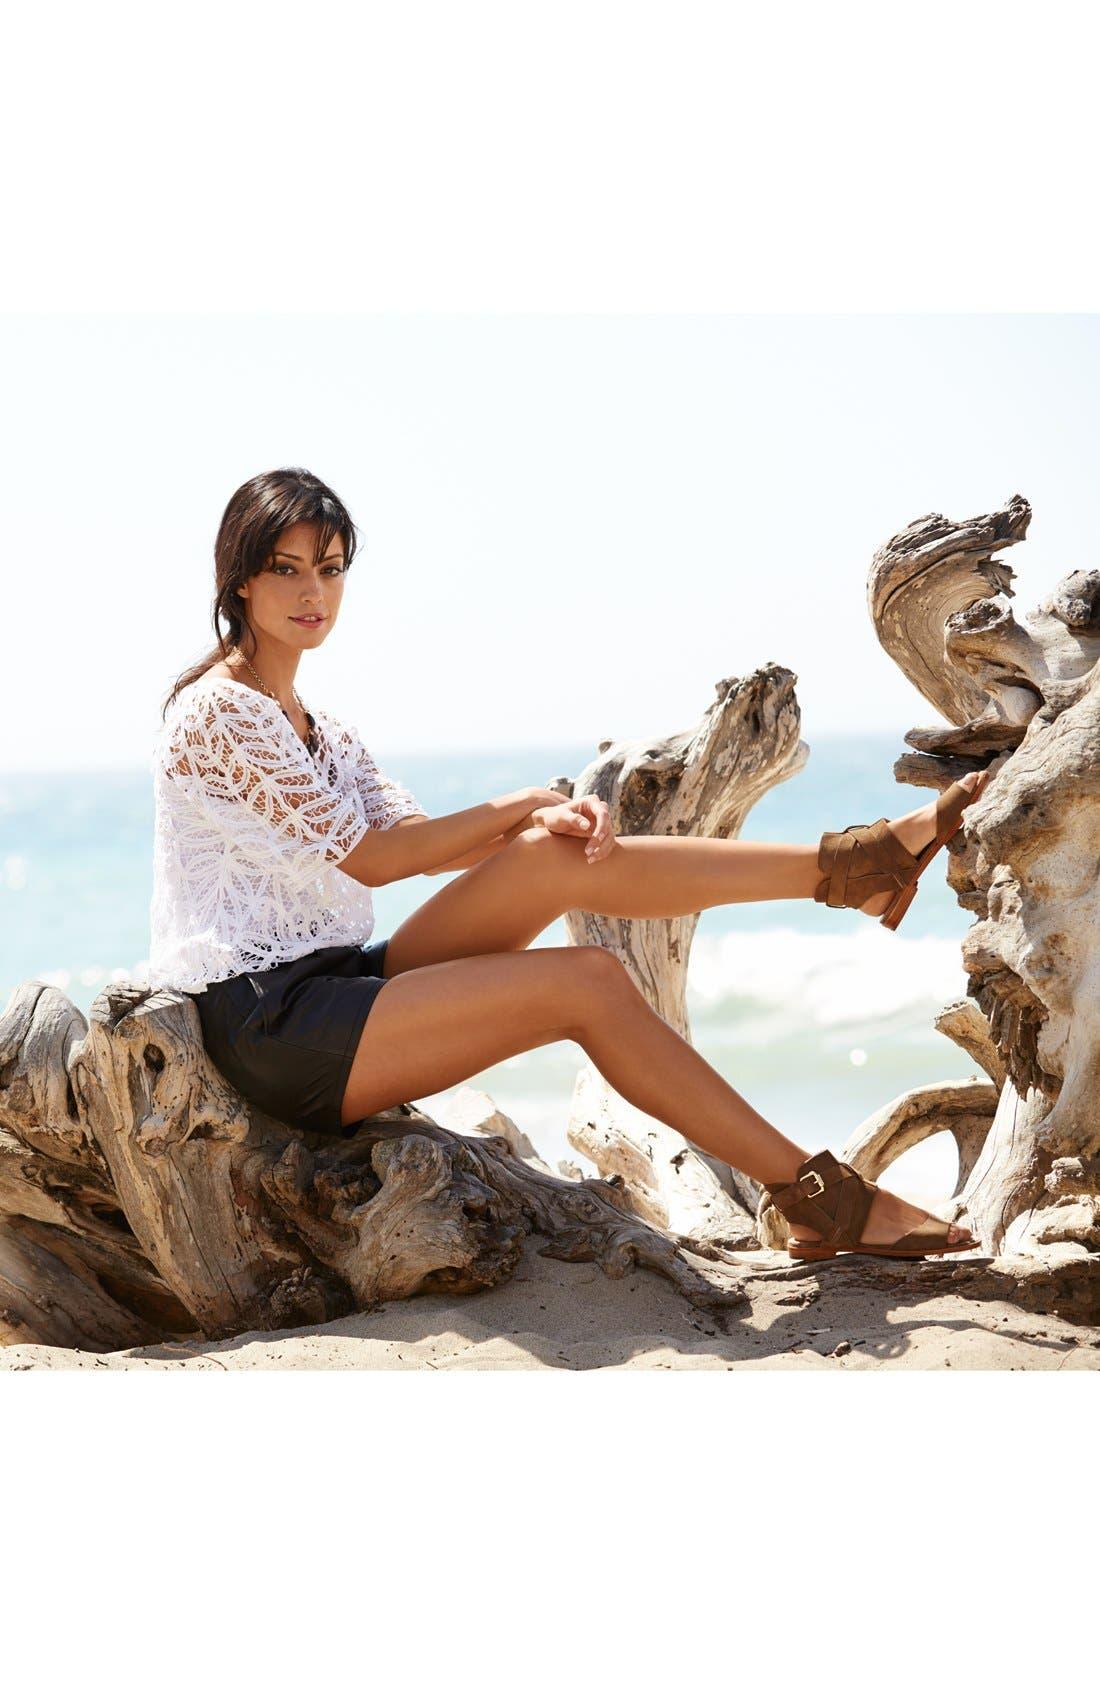 Alternate Image 1 Selected - VC Signature Sandal, Hinge® Crochet Top & Halogen® Leather Shorts